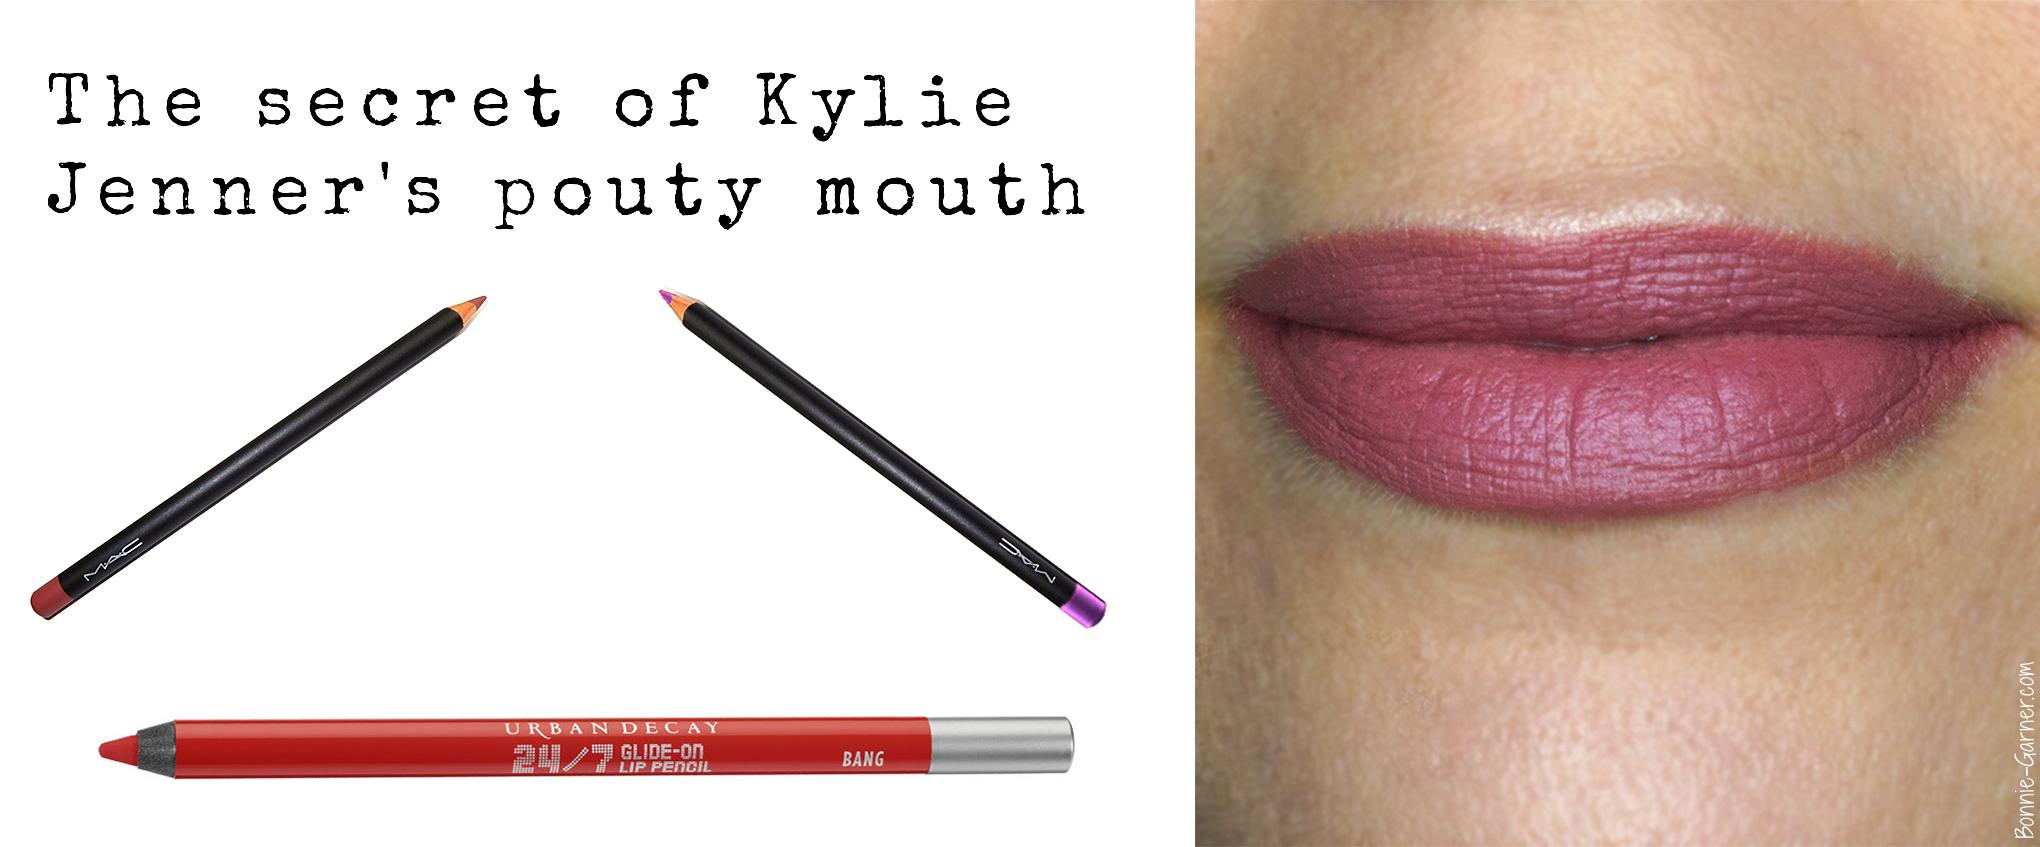 The secret of Kylie Jenner's pouty mouth